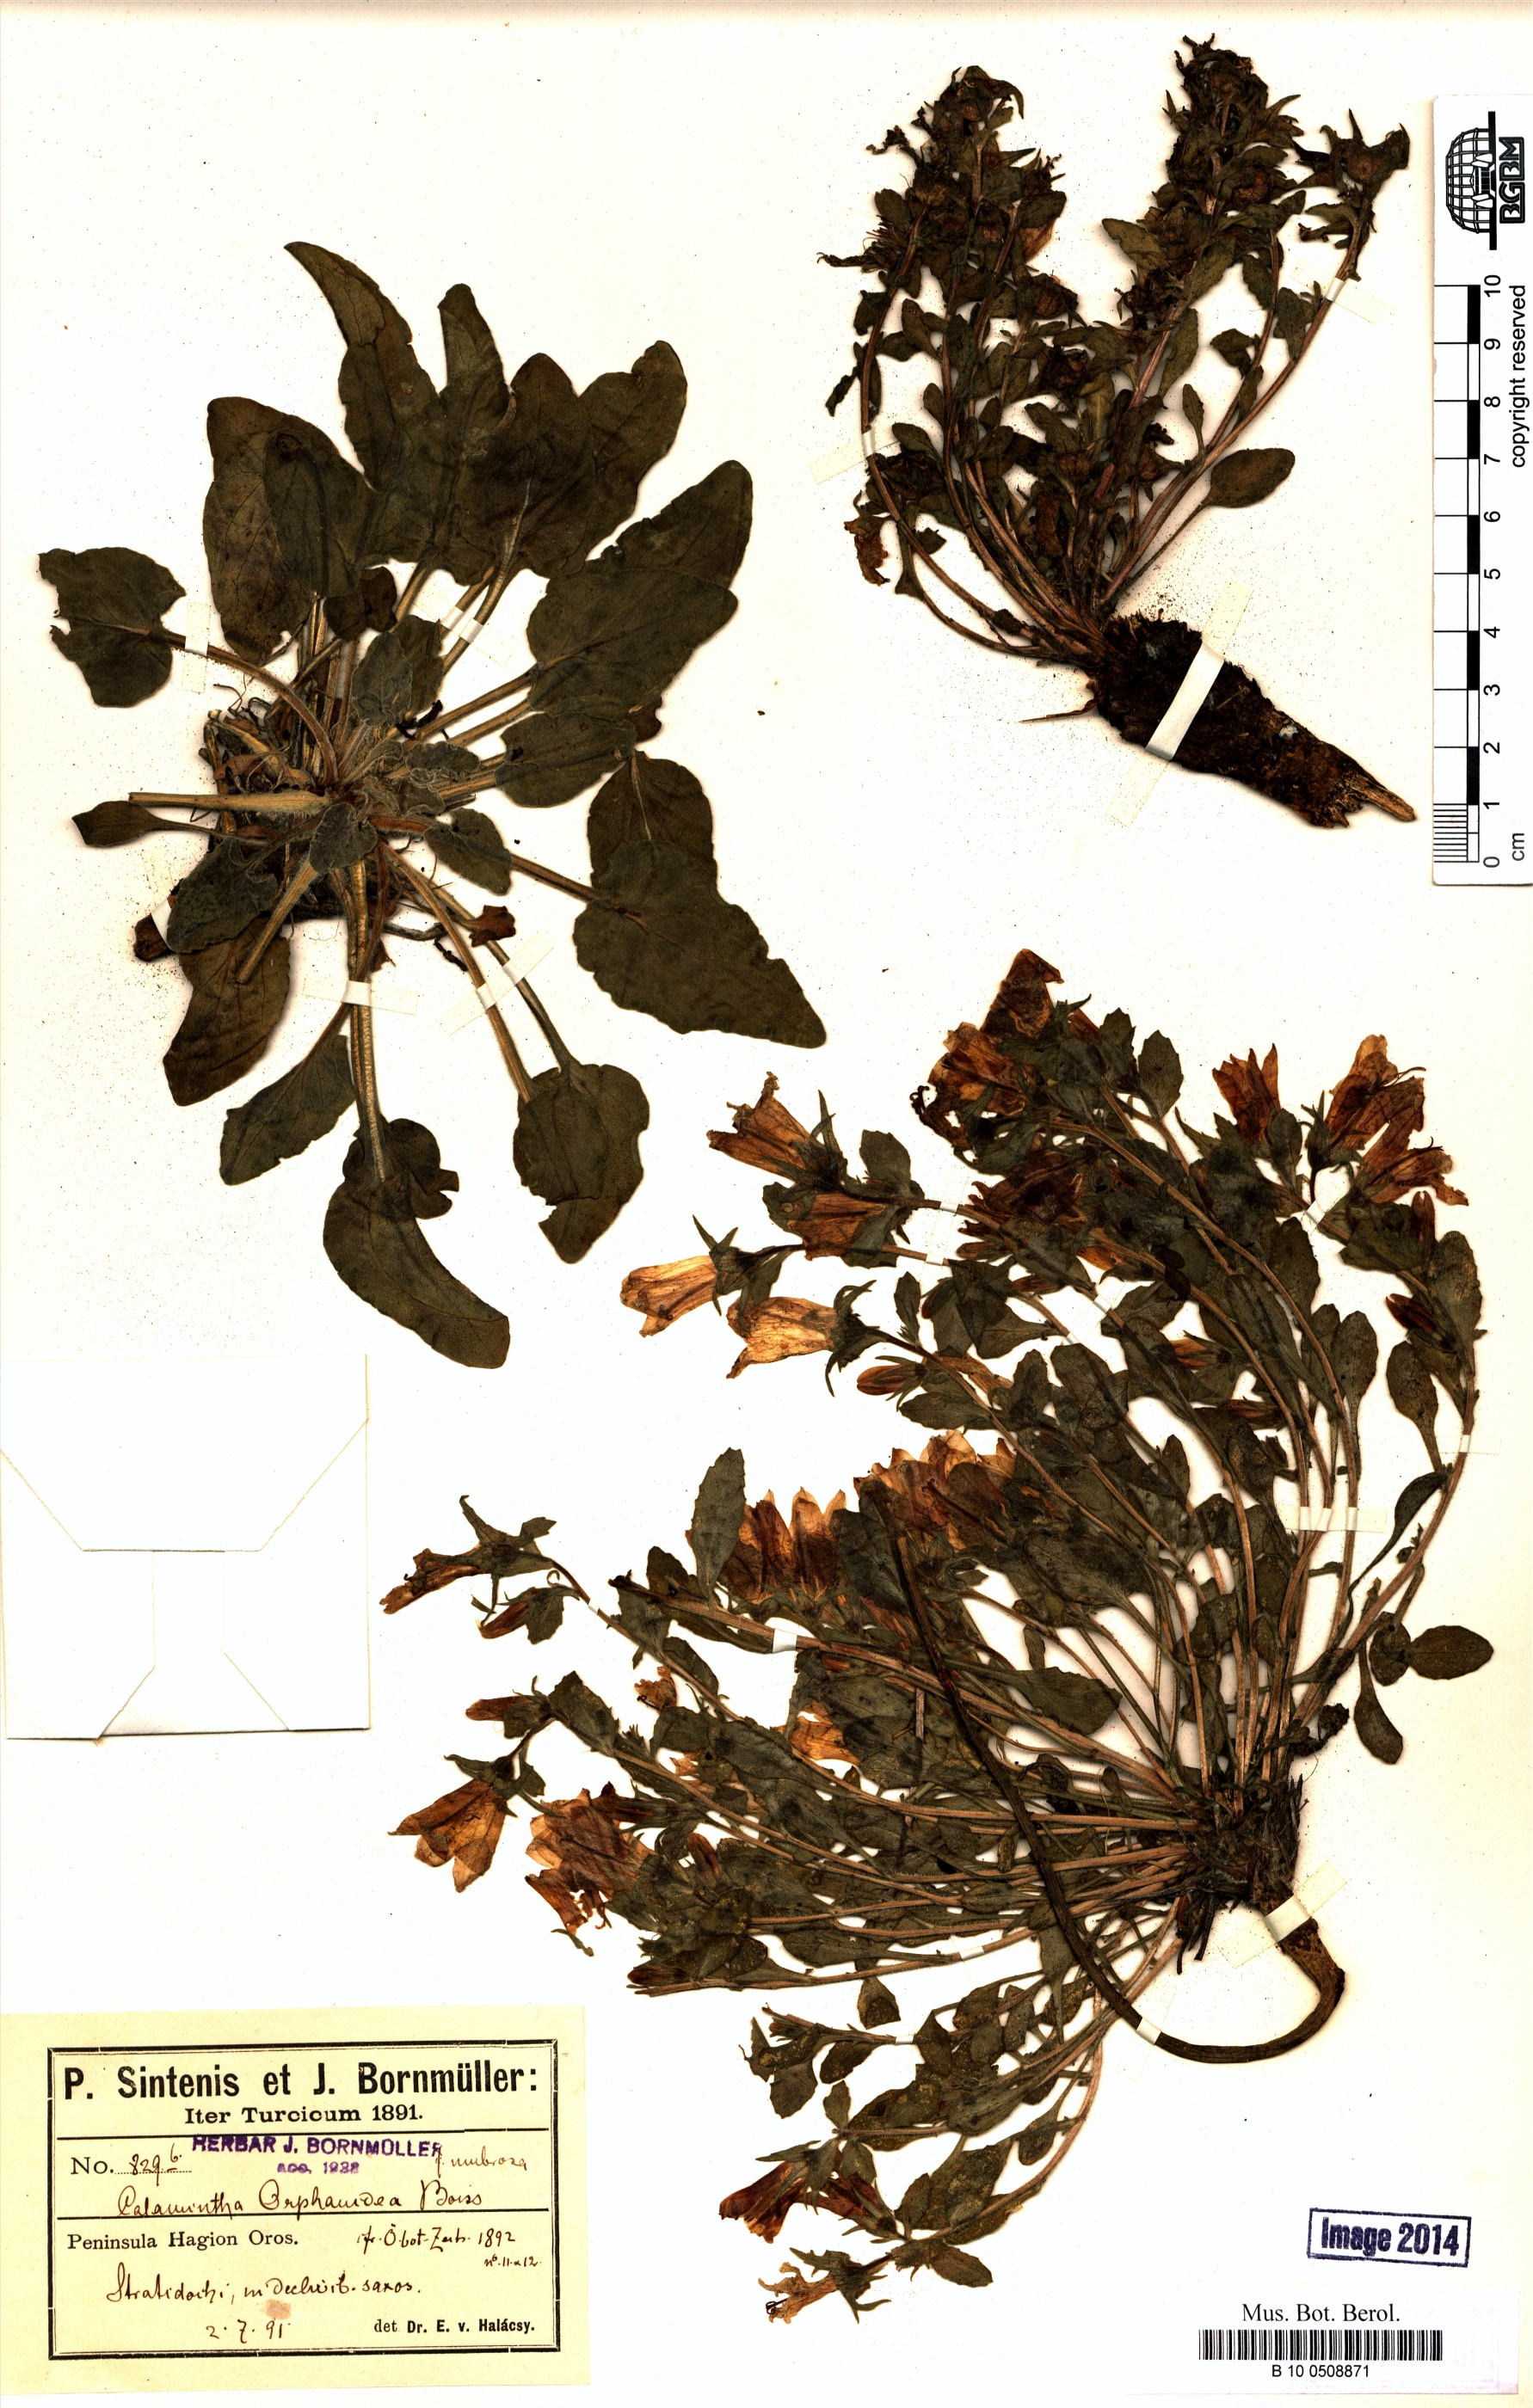 http://ww2.bgbm.org/herbarium/images/B/10/05/08/87/B_10_0508871.jpg